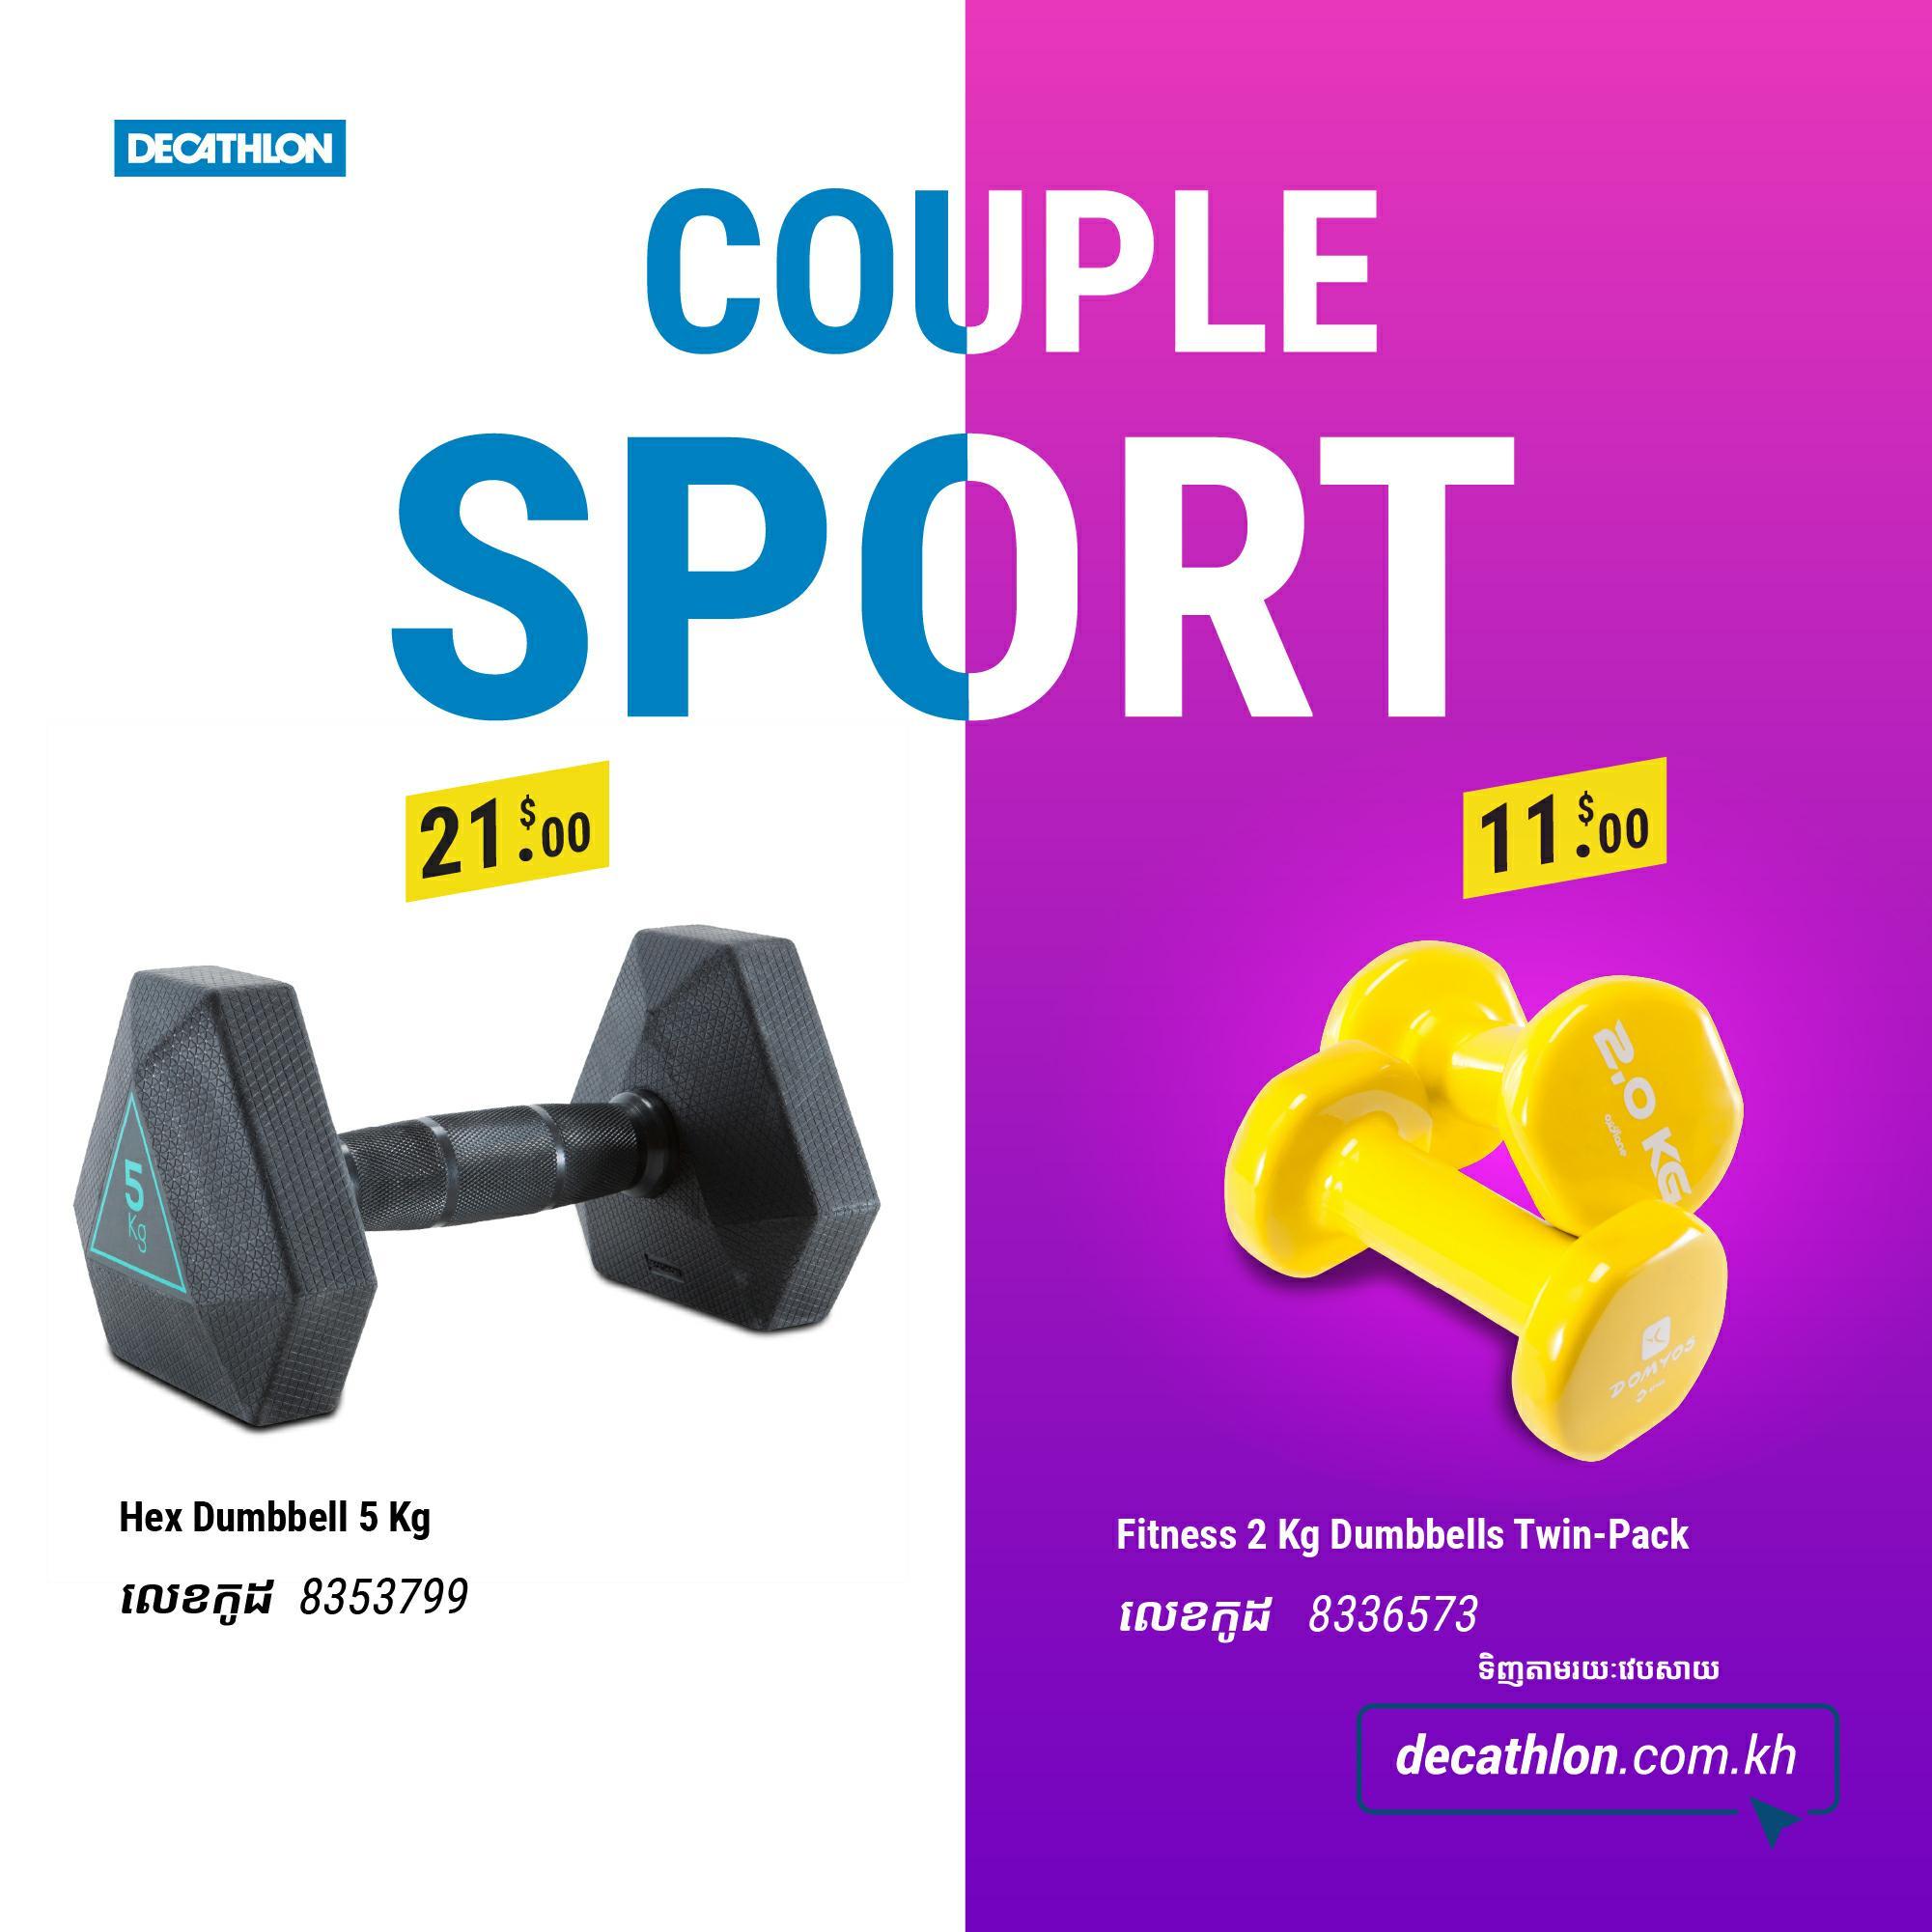 Couple Sport